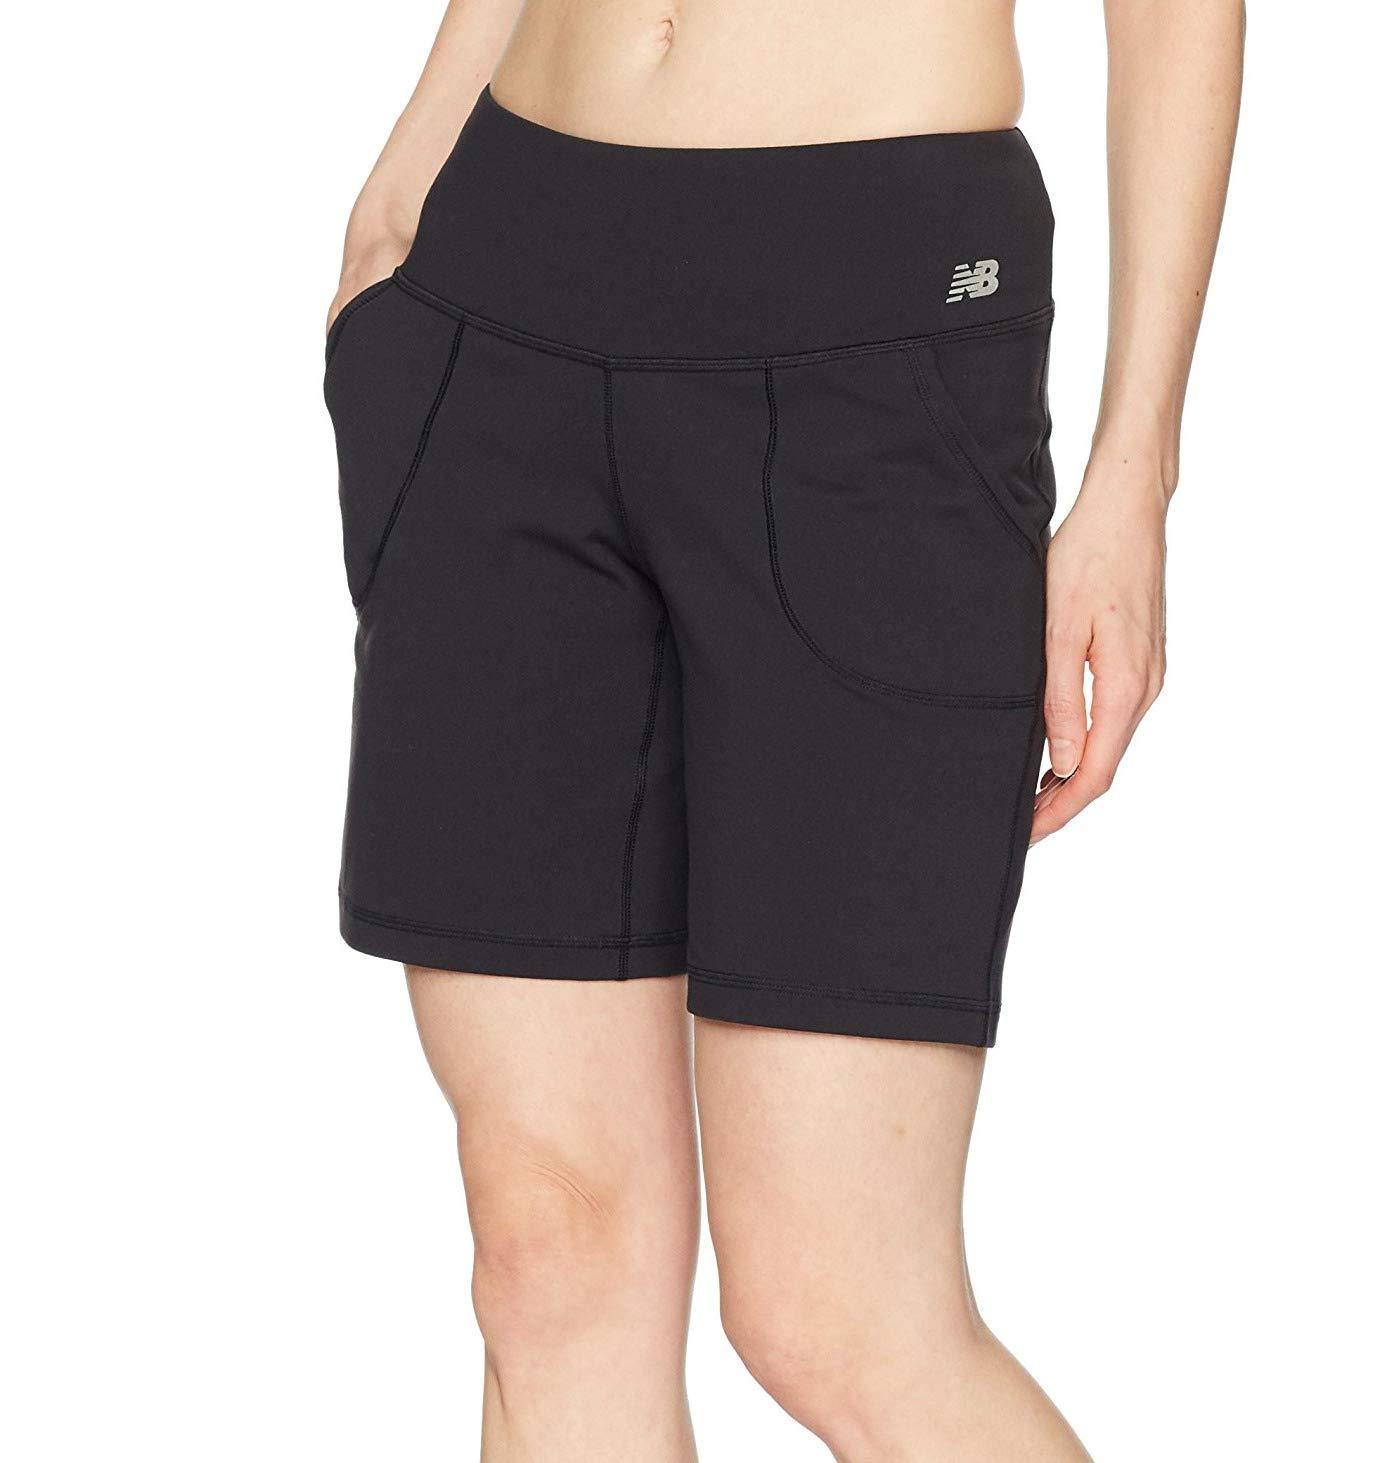 New Balance Women's Premium Performance 8-Inch Shorts, Black, Small by New Balance